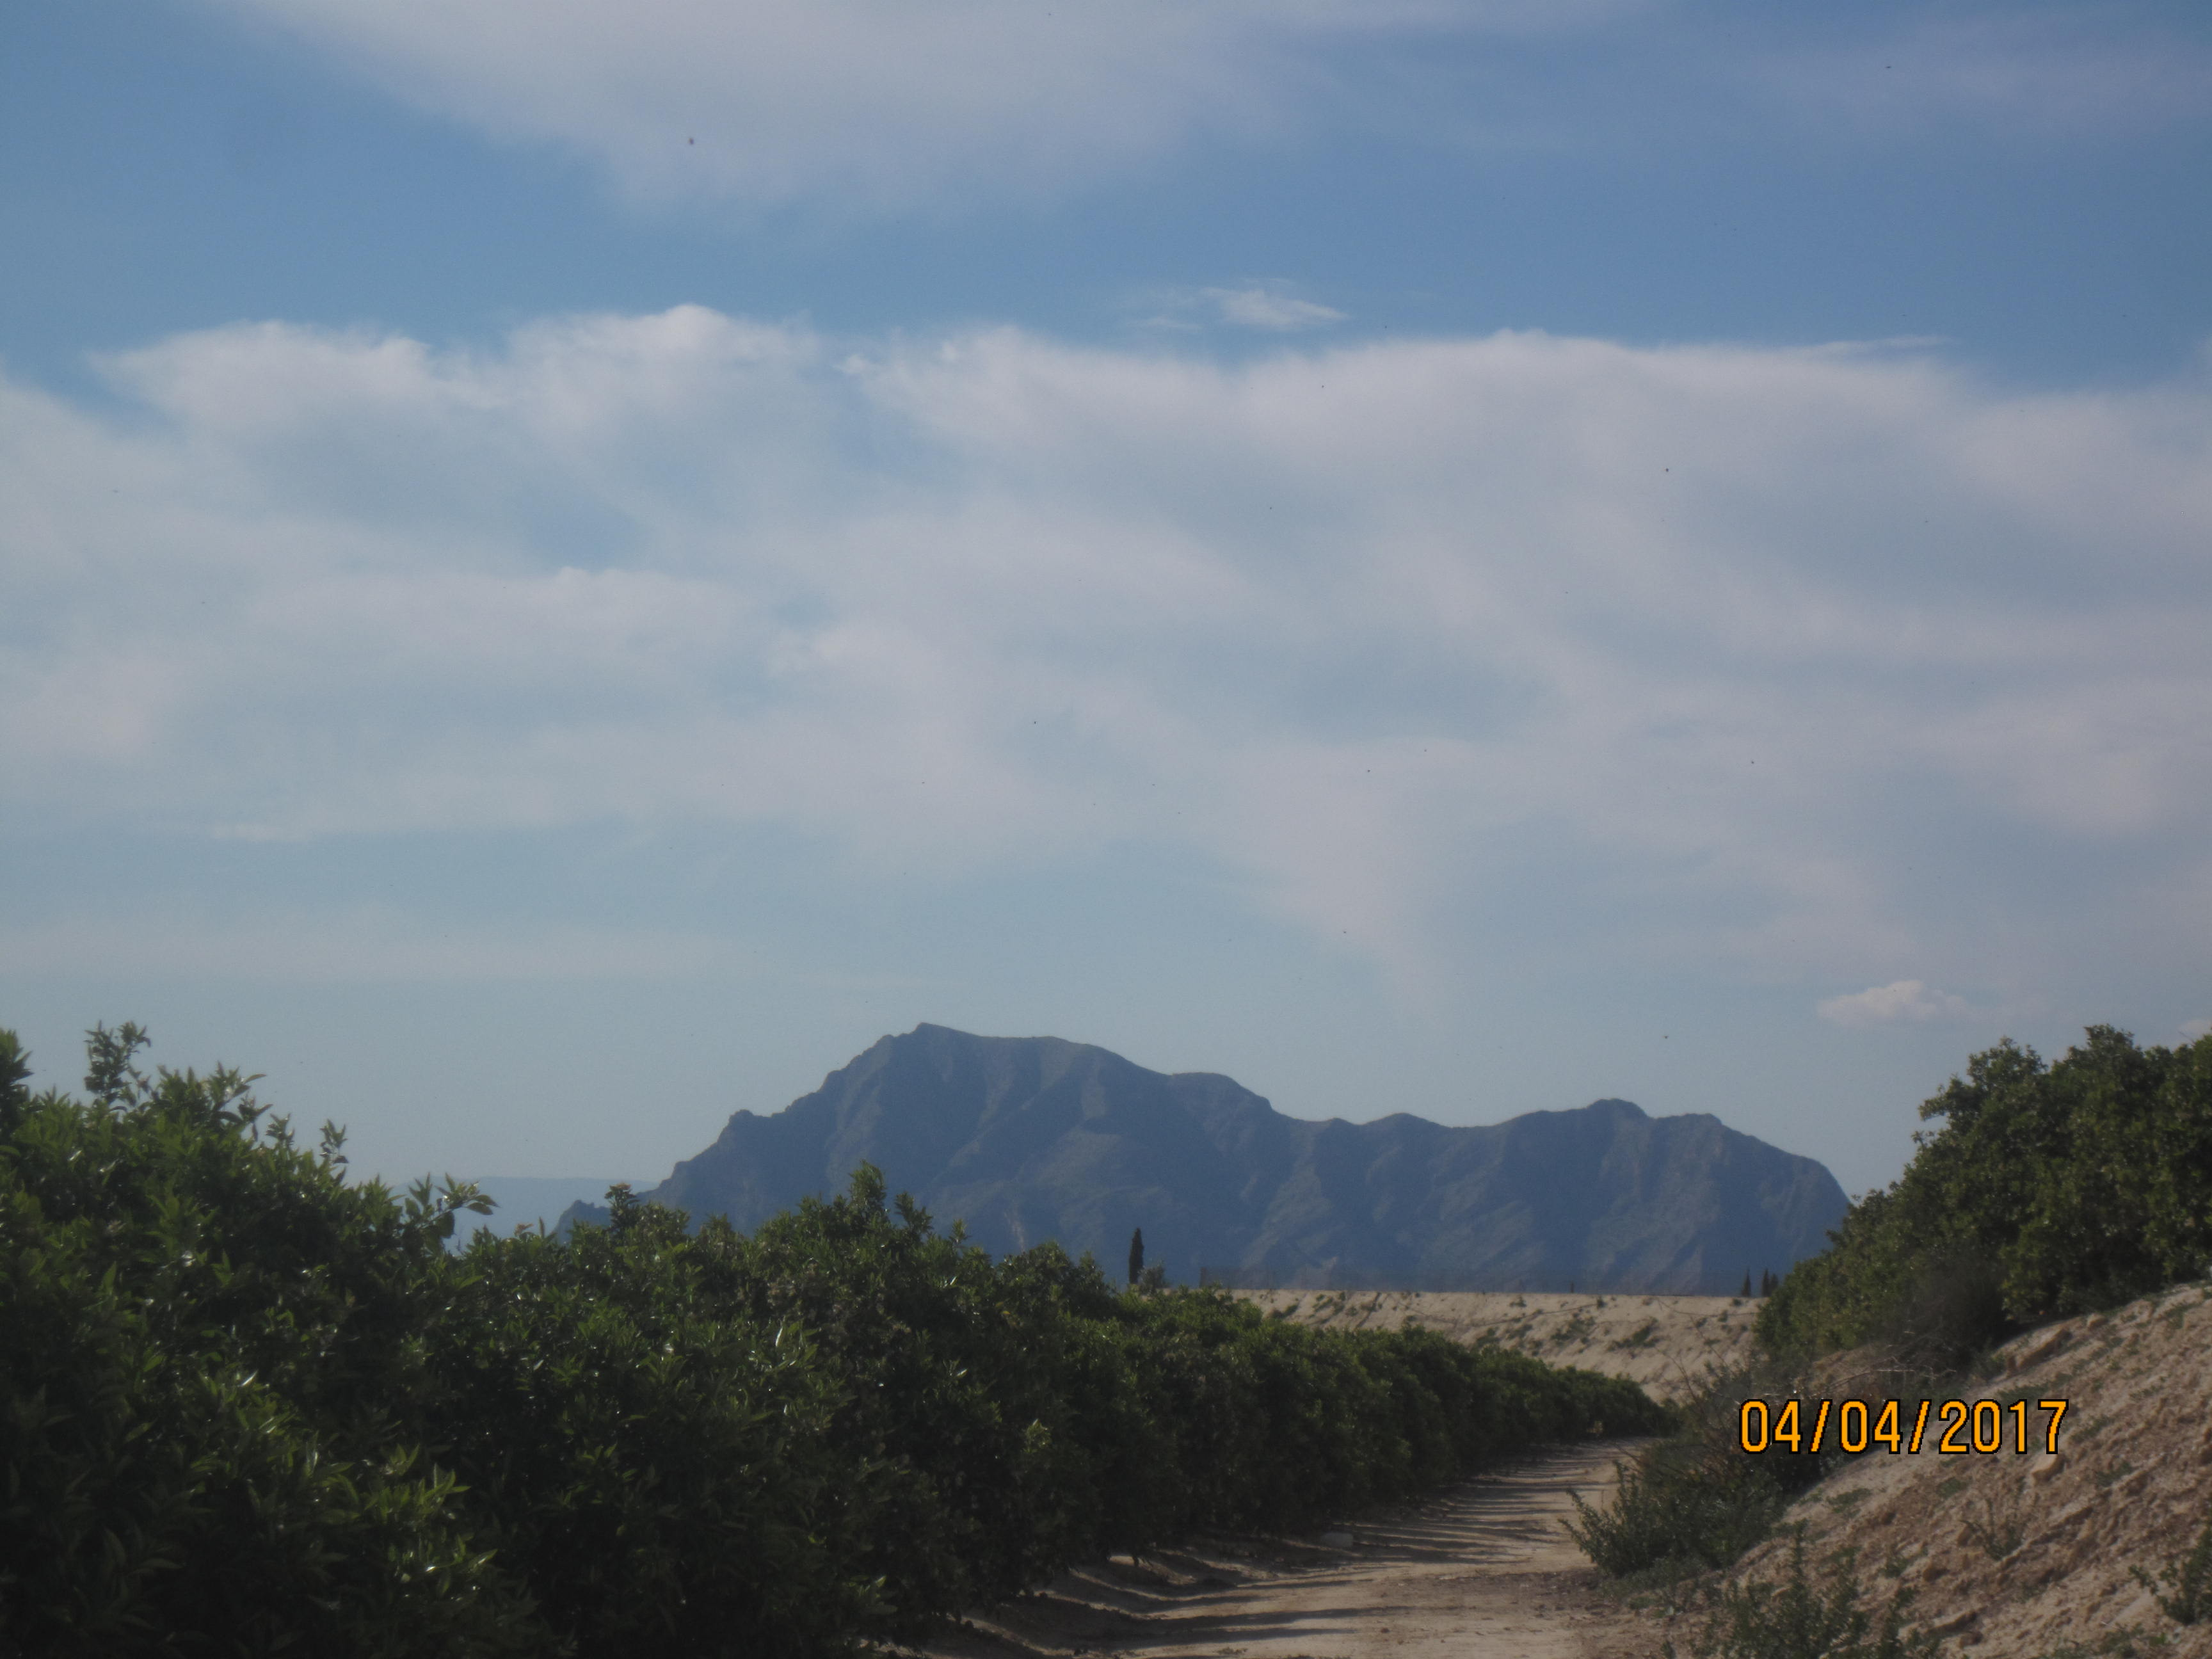 Mountain, snake 004